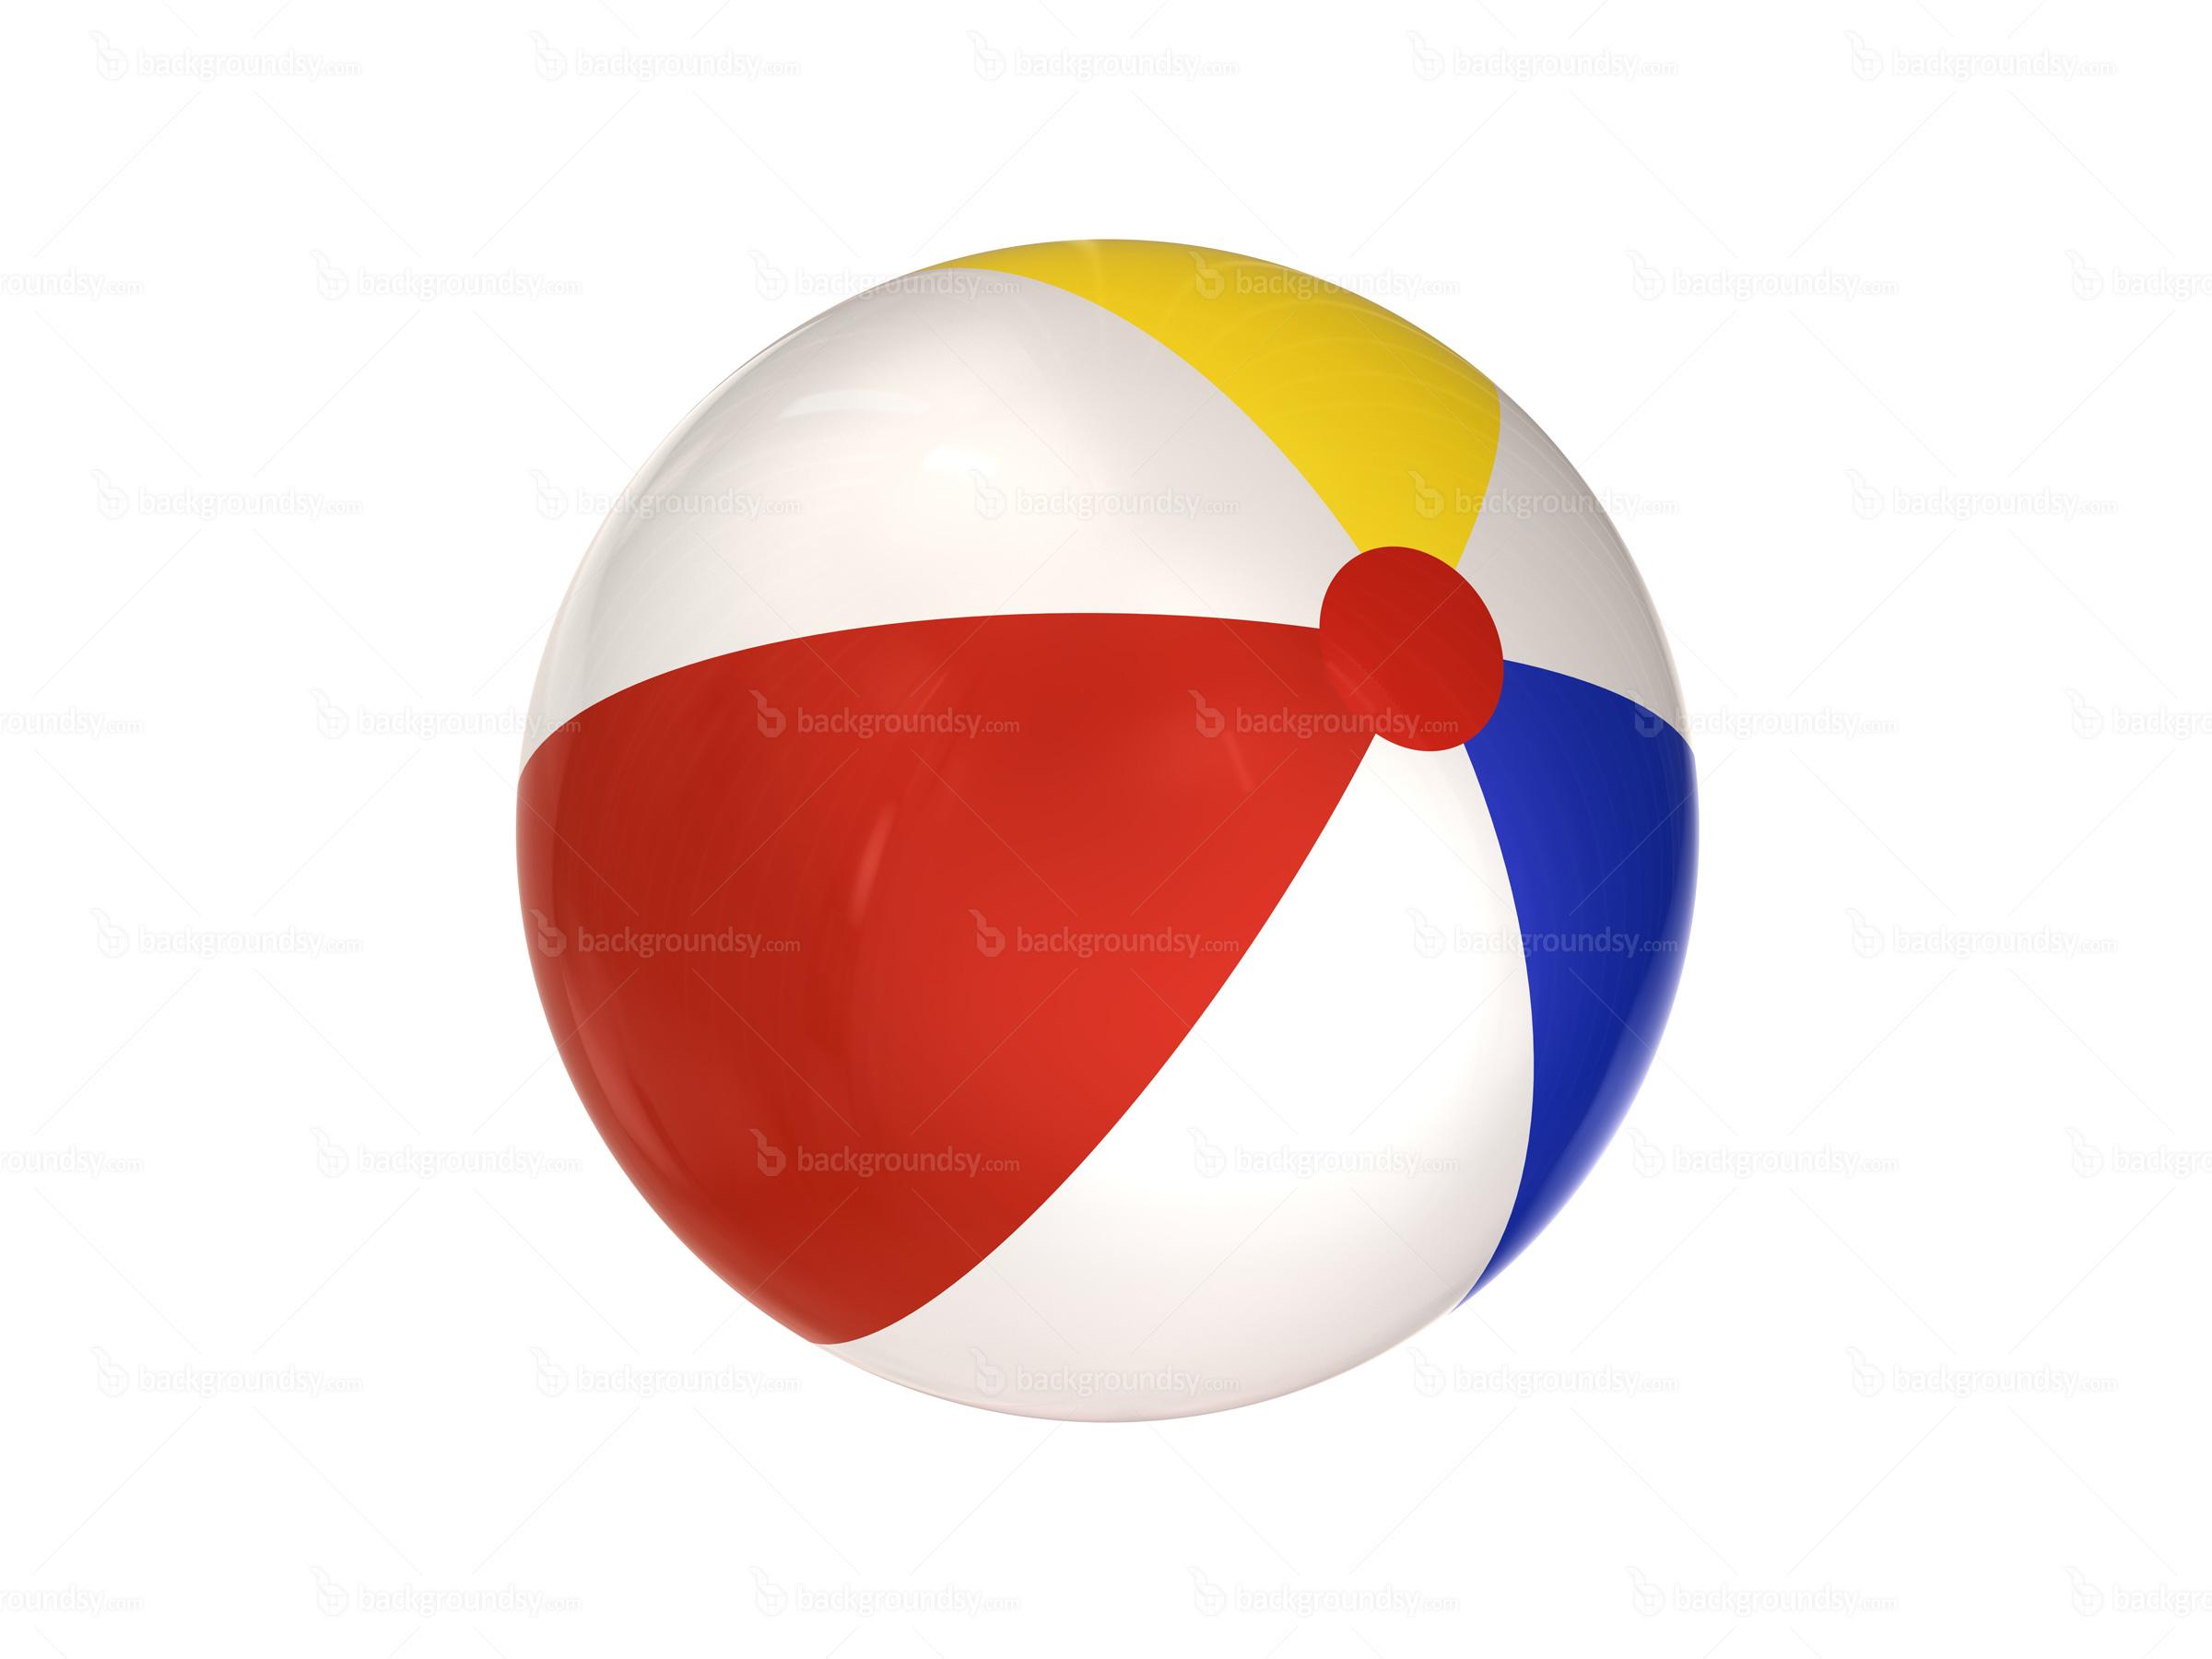 Beachball clipart colourful ball. Beach backgroundsy com